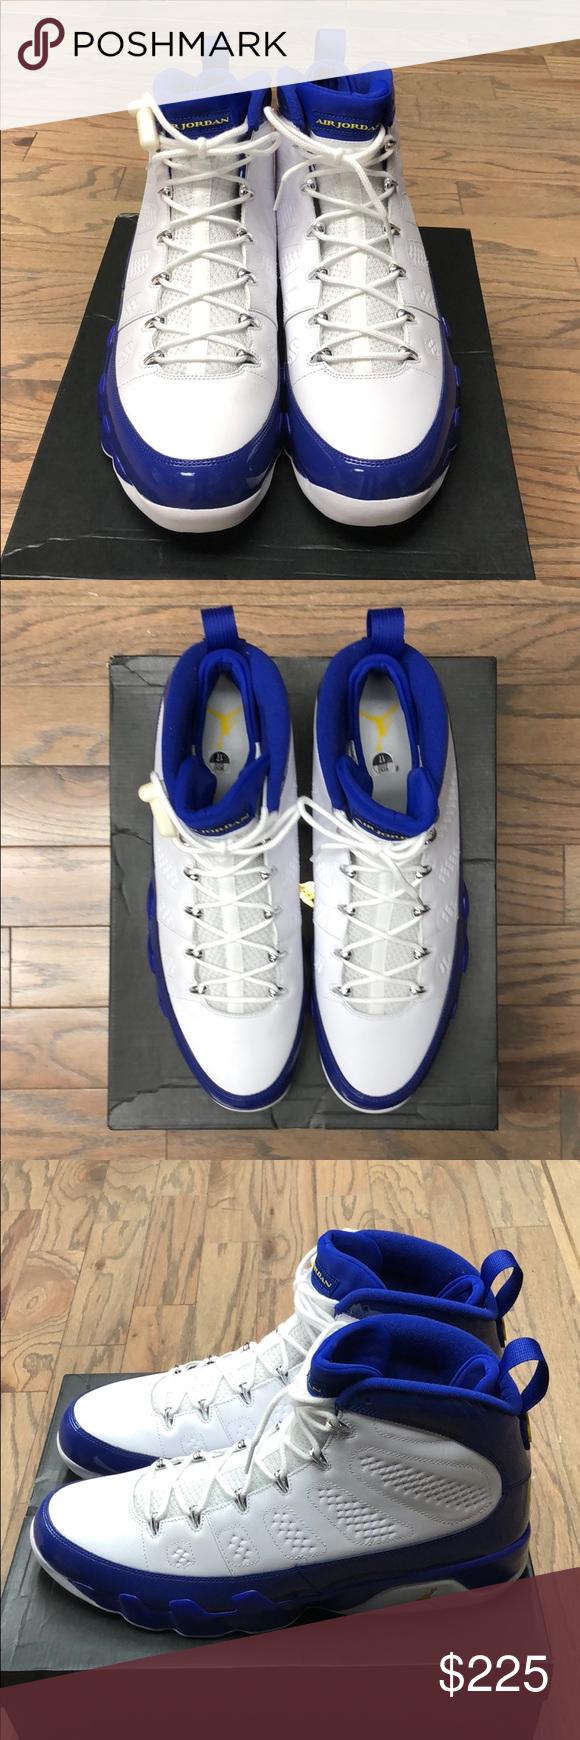 "31109d14f45 Air Jordan 9 Retro ""Kobe PE"" Deadstock, Brand New Air Jordan 9 Retro ""Kobe  PE"" Size 17, Color-White/Concord/Tour Yellow, 302370-121, 100% Authentic  Nike ..."